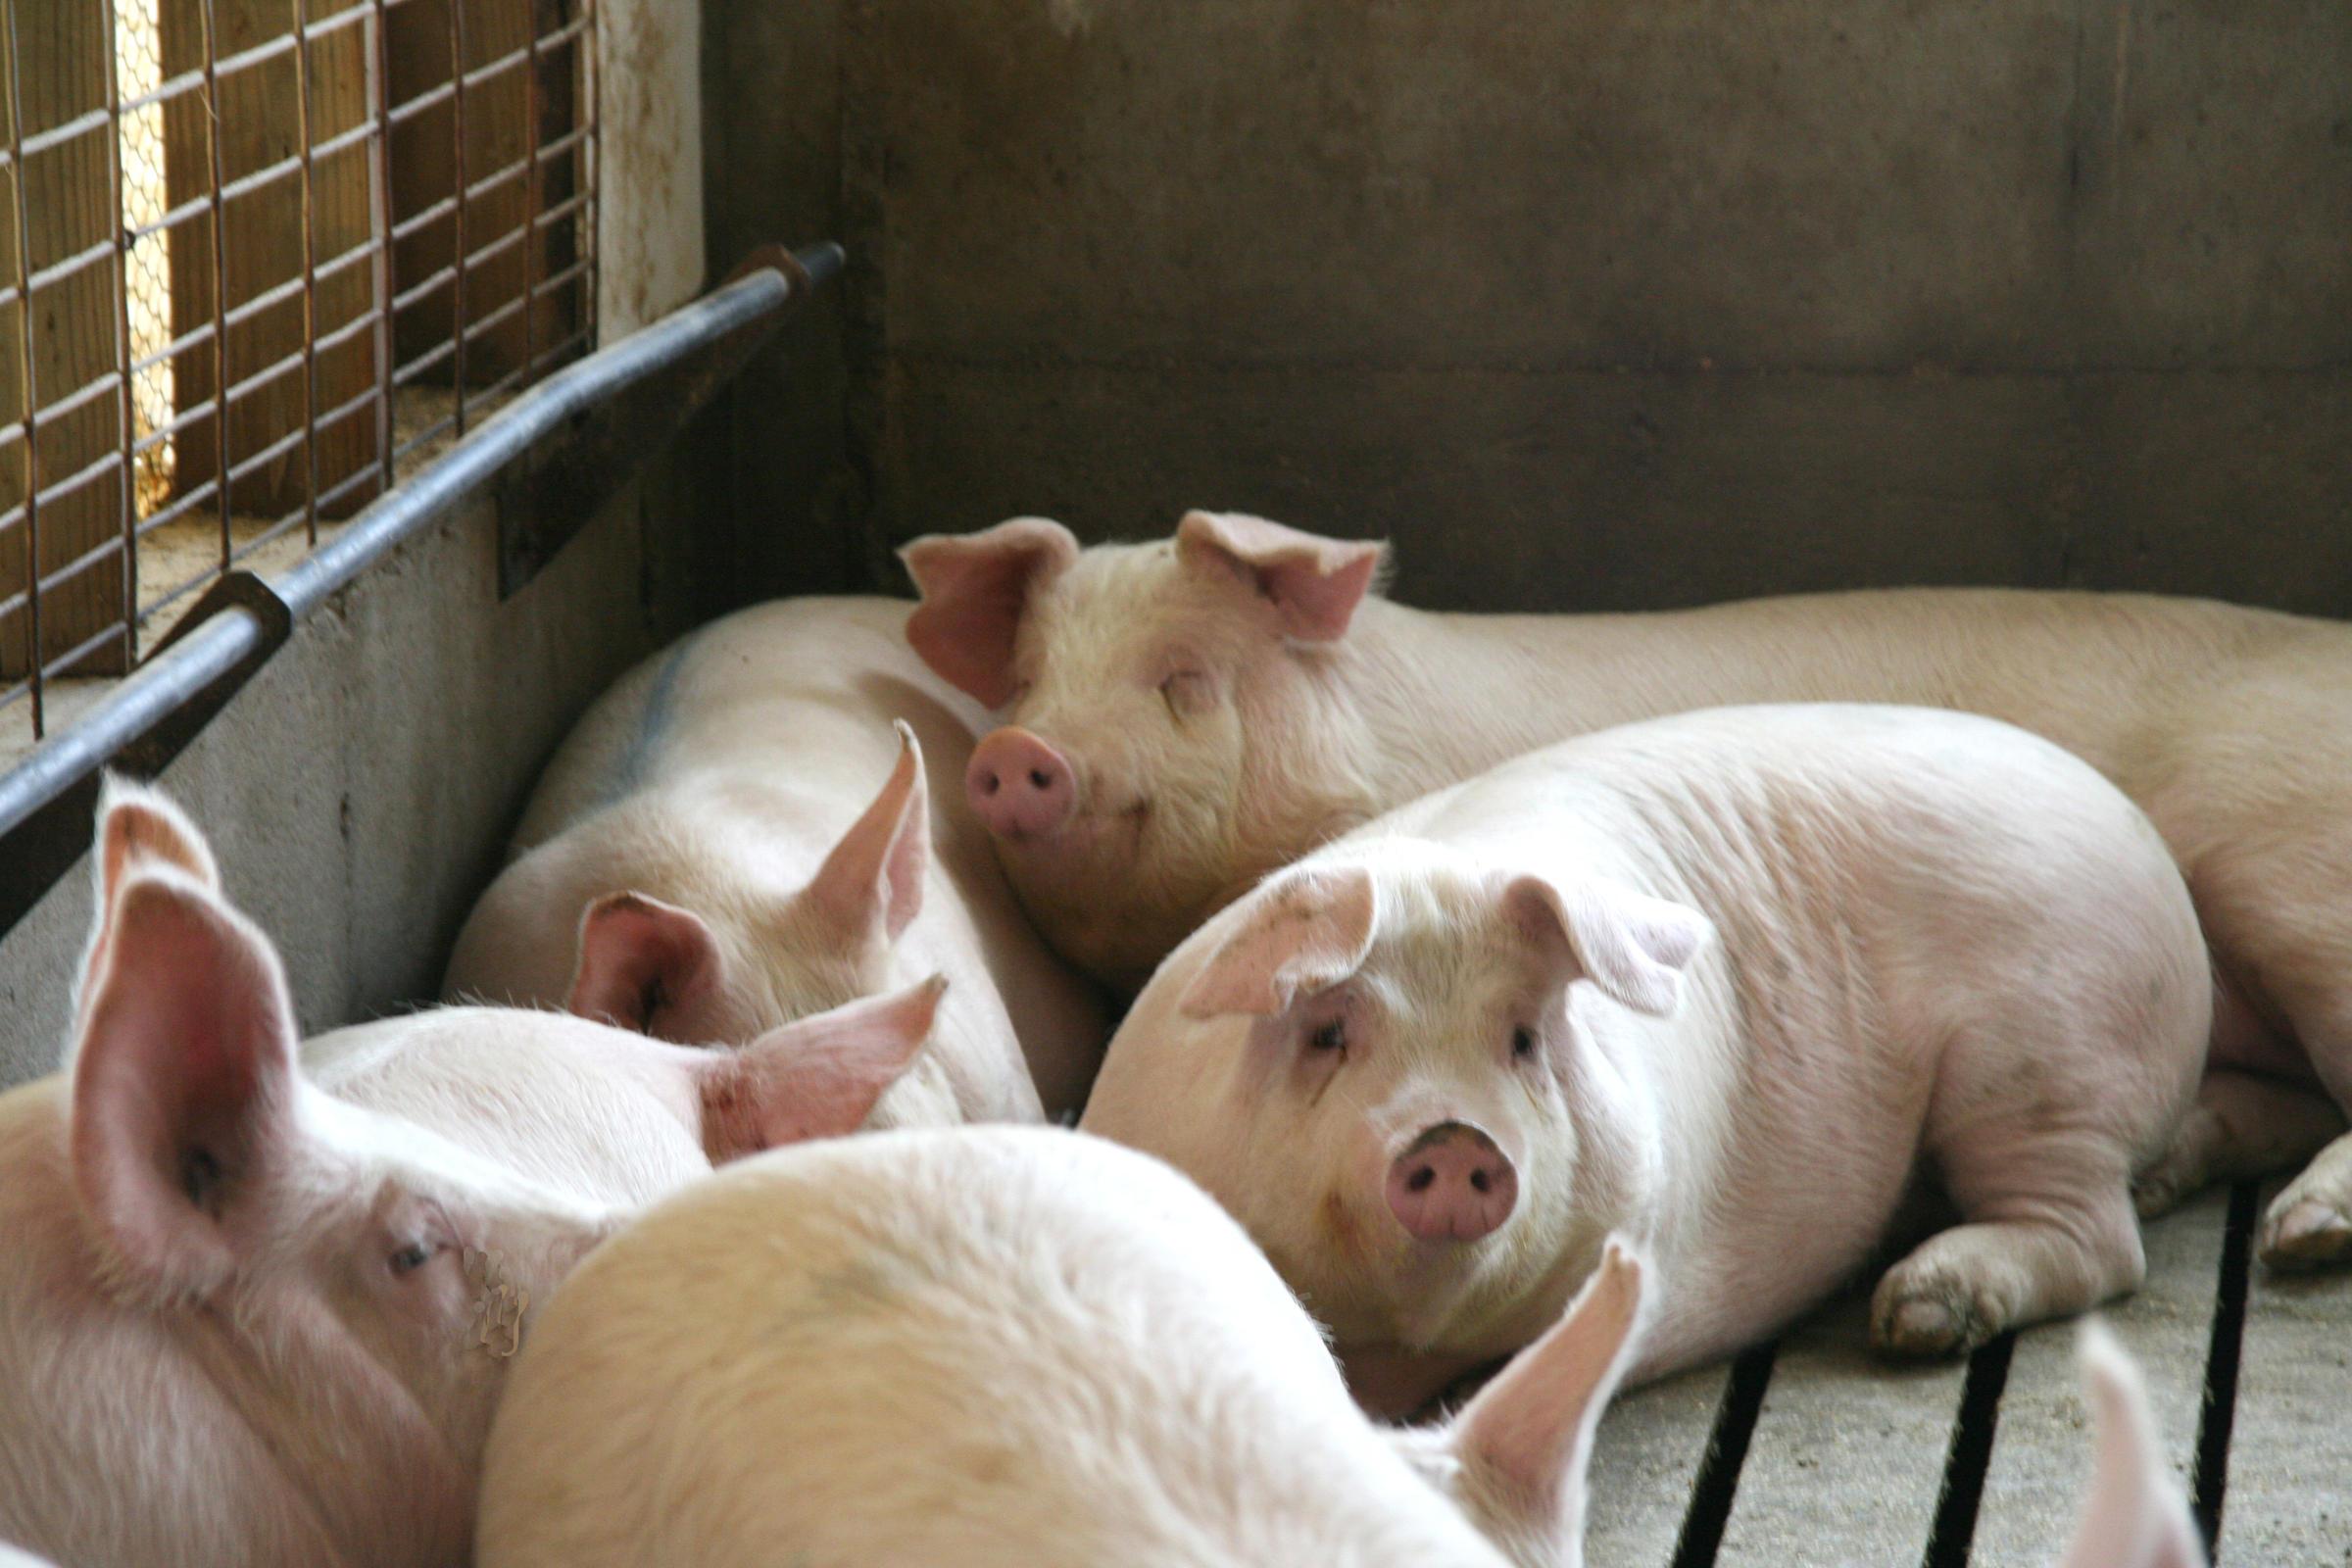 Illinois Issues: Big Swine Operations Put Residents, Pig